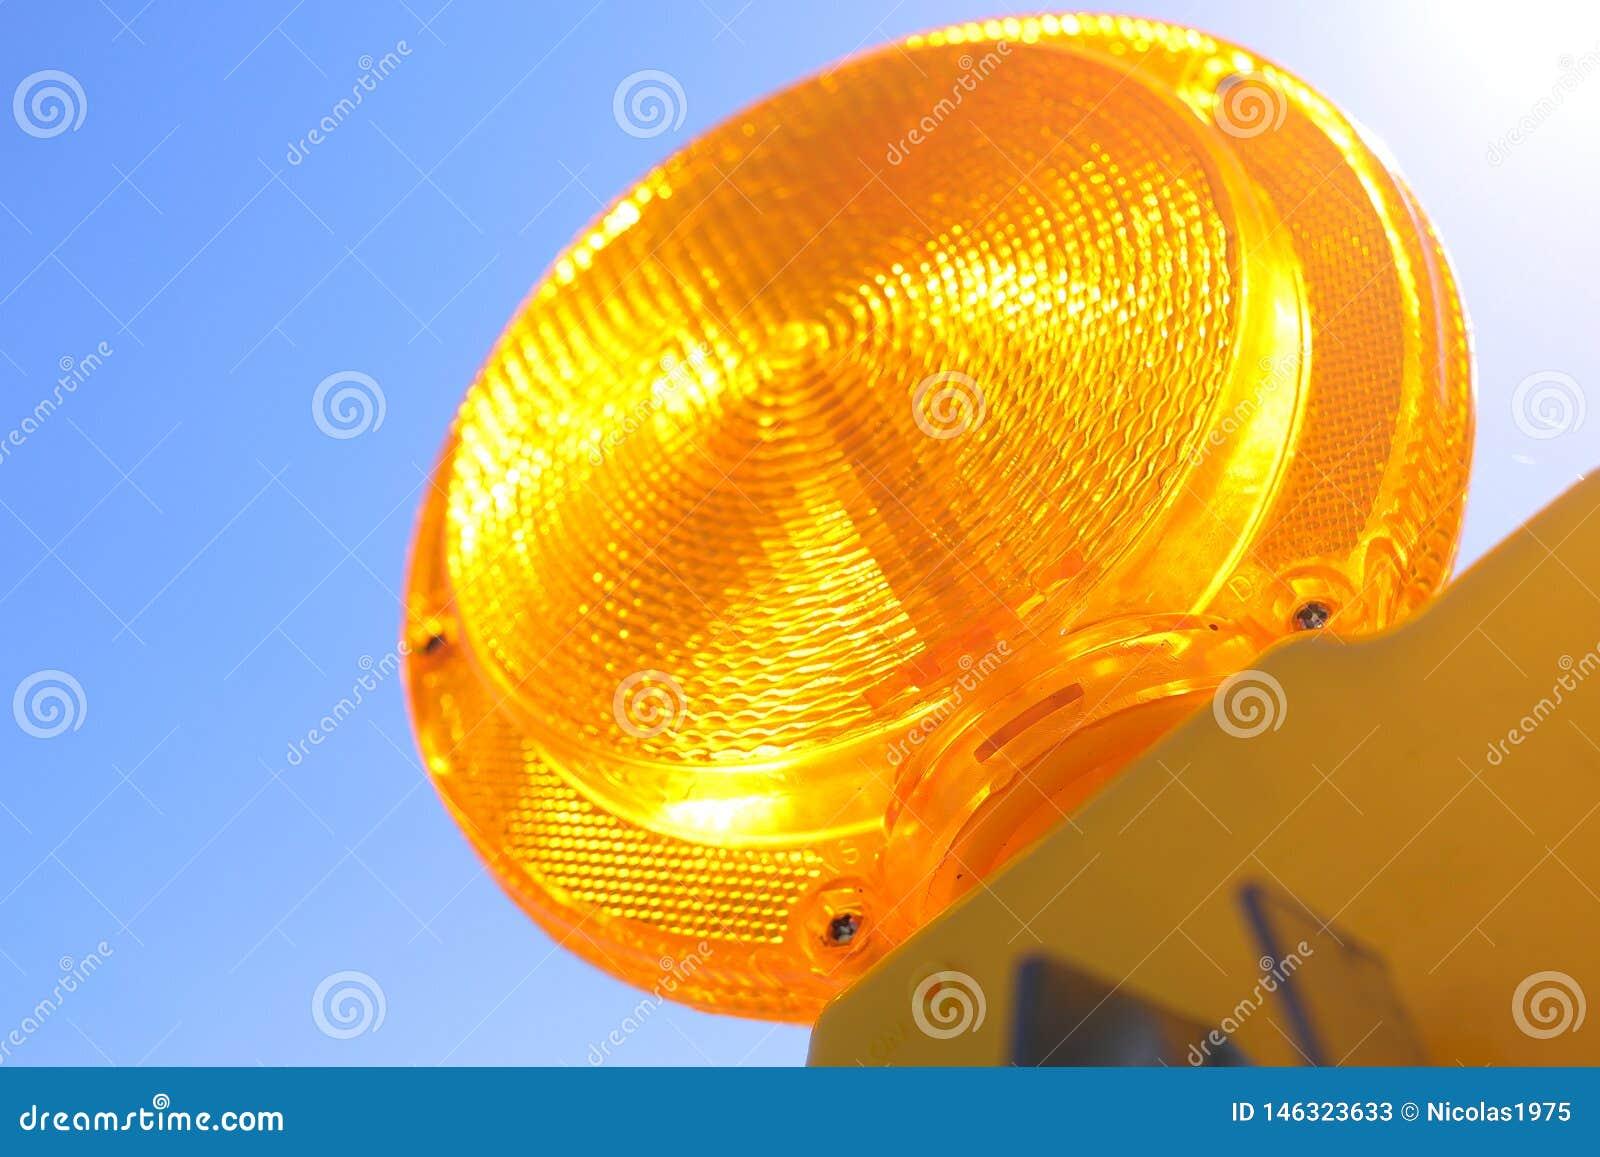 Traffic Barricade lamp